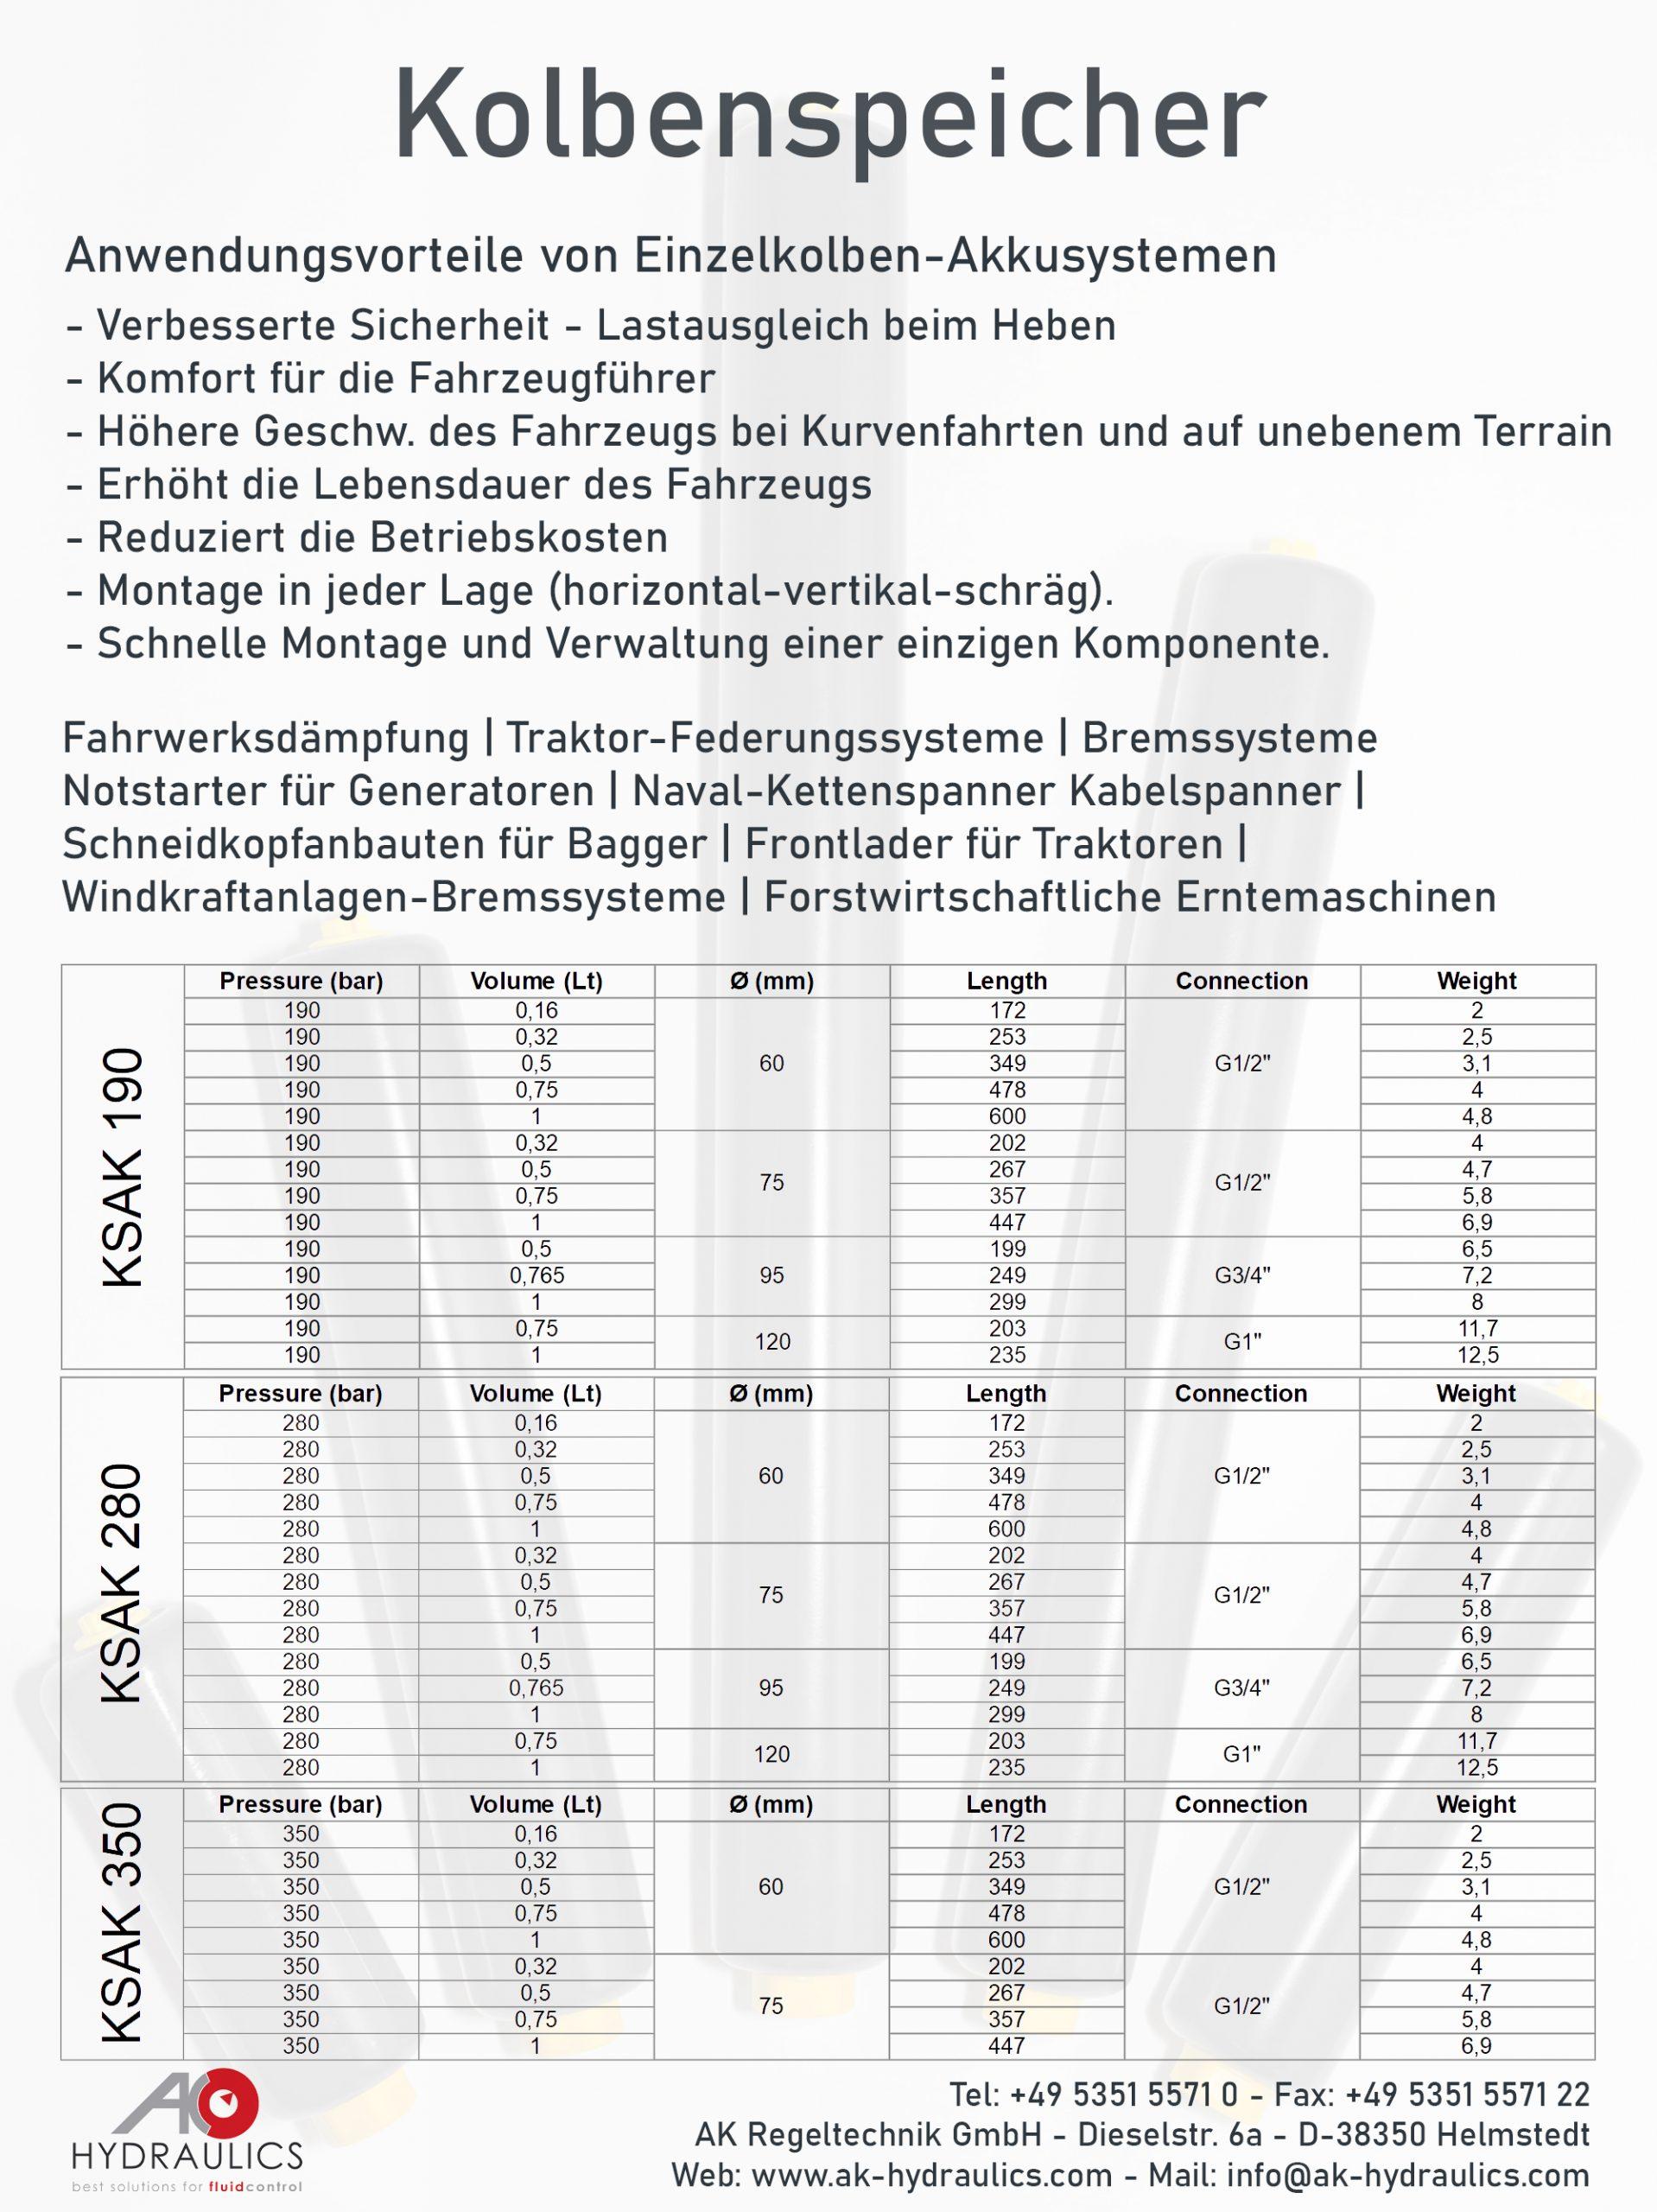 Kolbenspeicher – AK Regeltechnik – Piston Accumulators DE 4